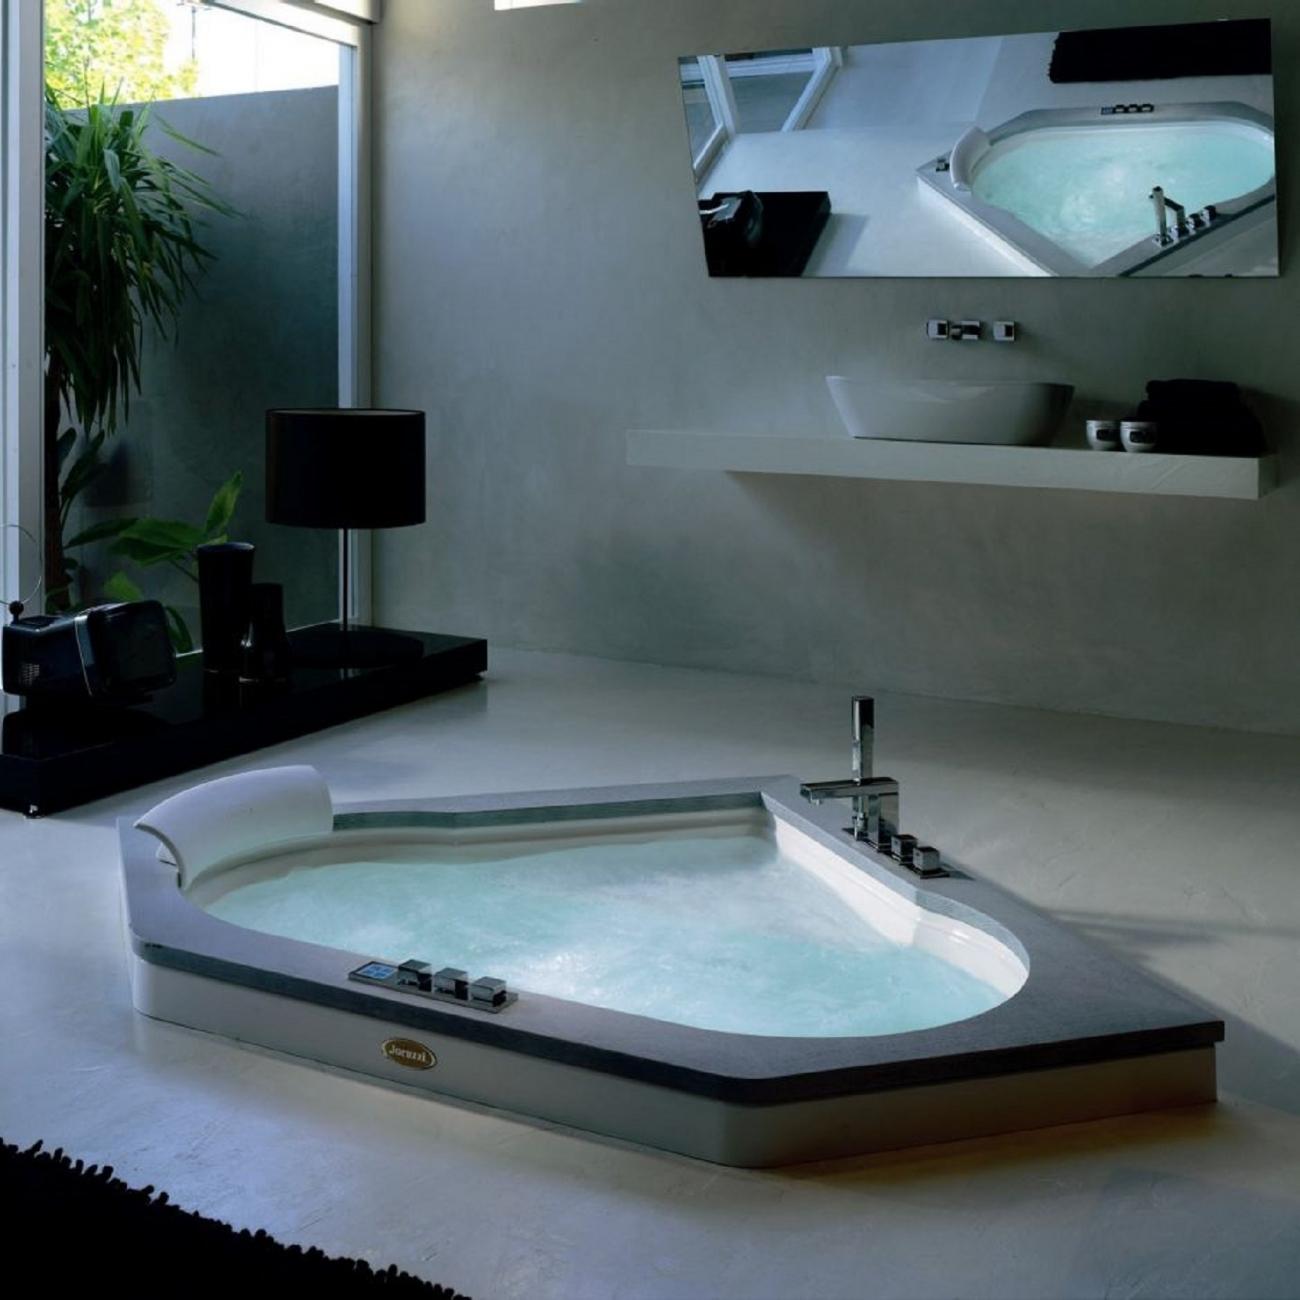 Jacuzzi Whirlpool Bath Jacuzzi.Jacuzzi Aura Corner Stone Whirlpool Bath Tattahome